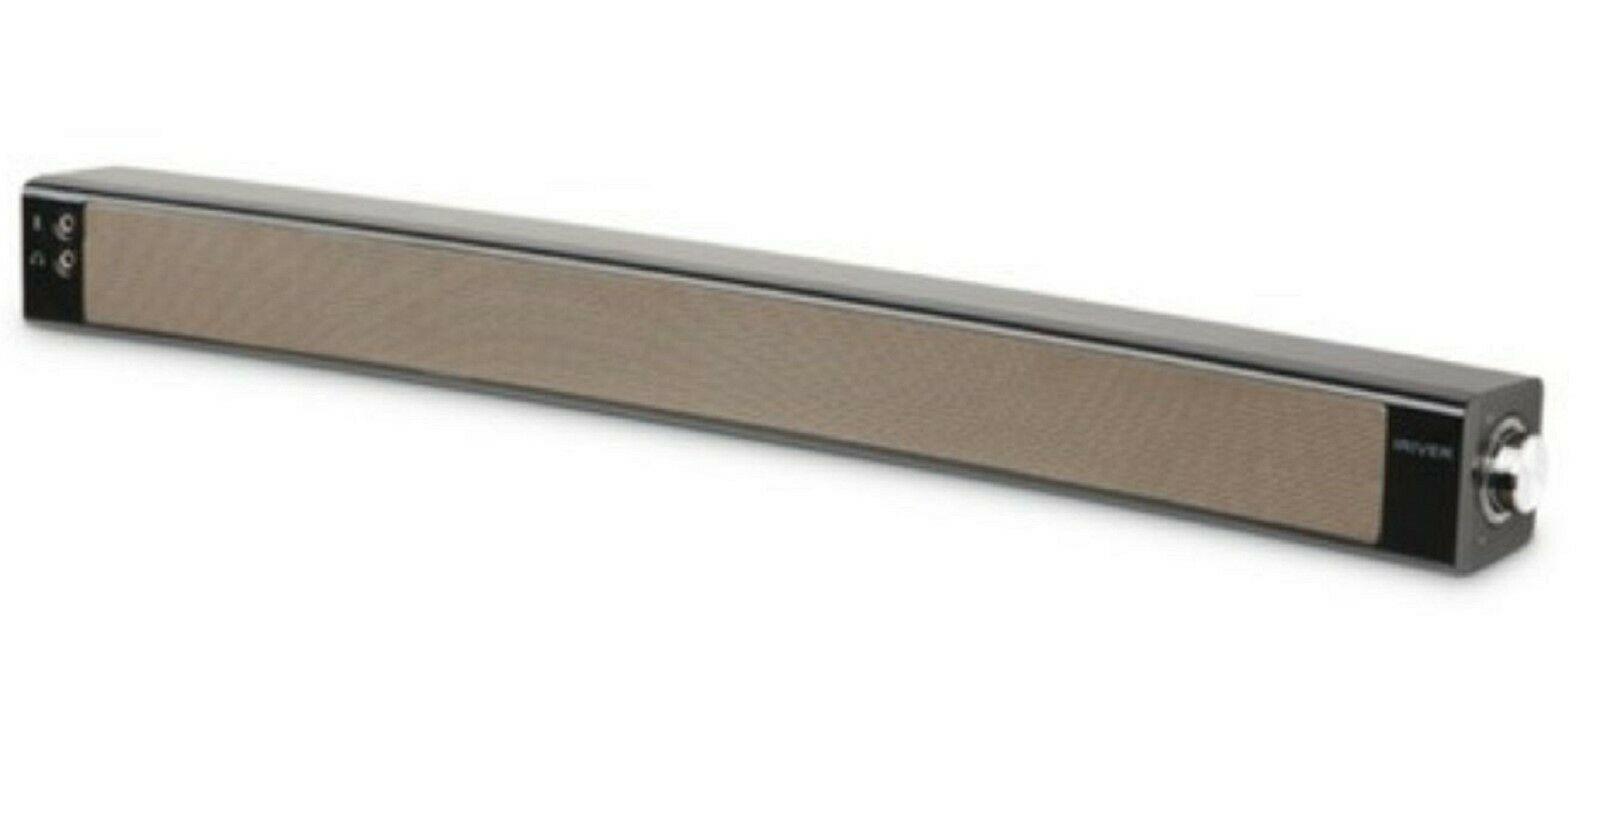 iRiver IR-SB200 USB Powered Curved Sound Bar PC Computer Speaker (Black)